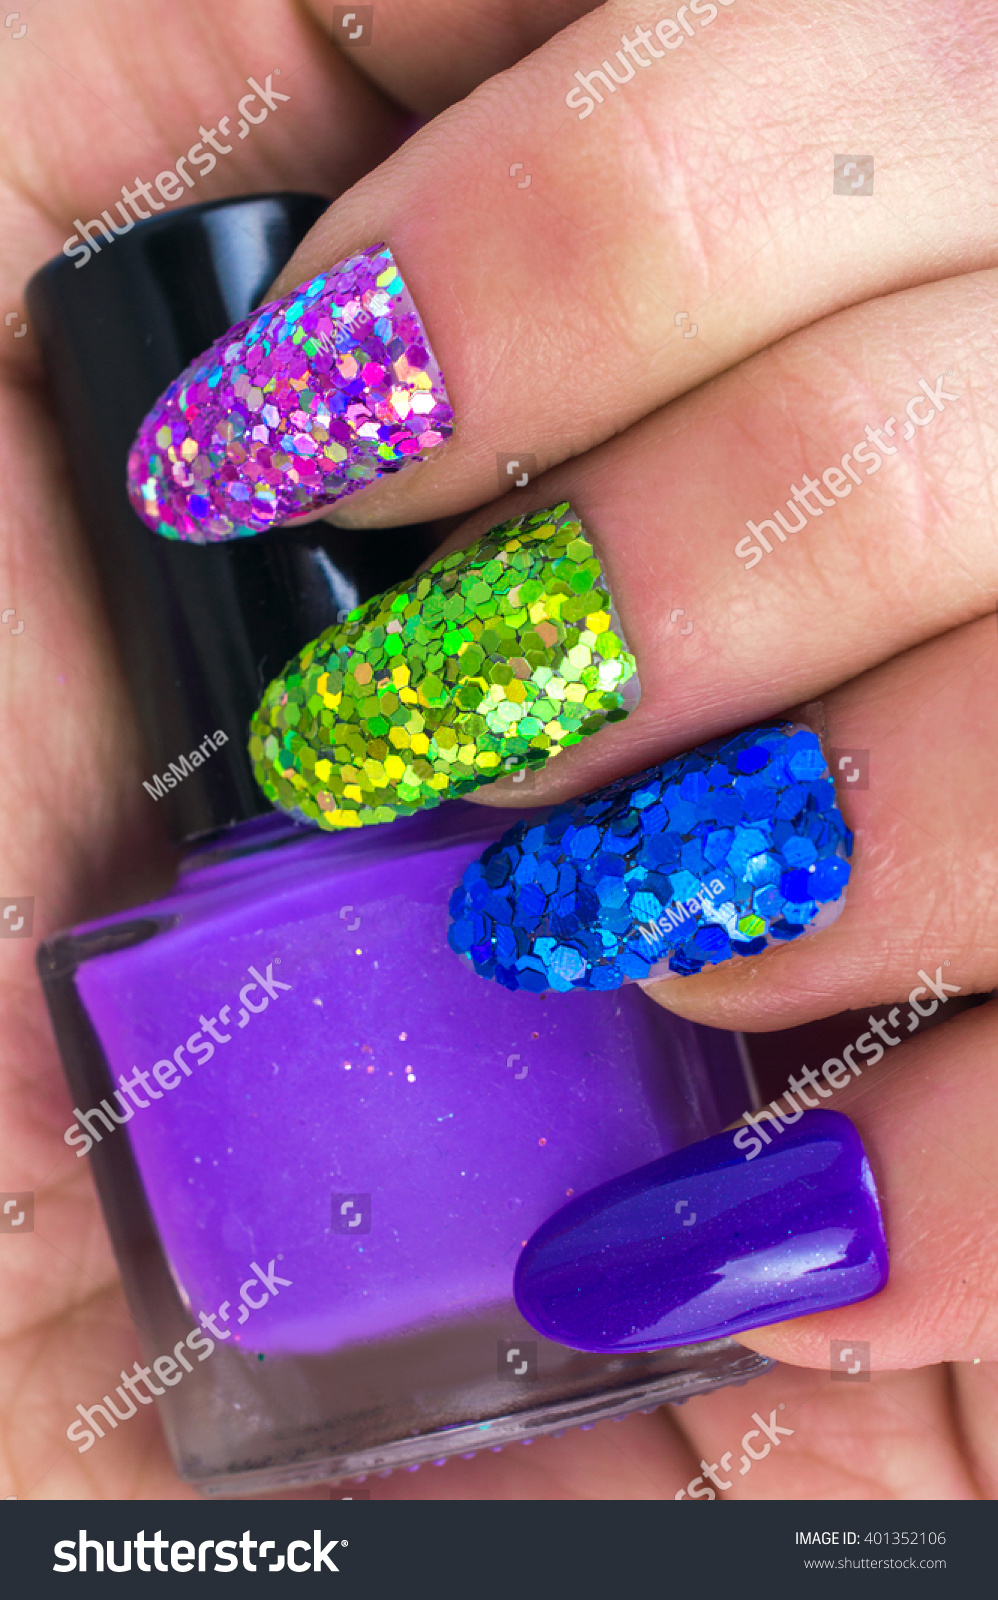 Fashionable Stylish Colorful Nails Nail Polish Stock Photo